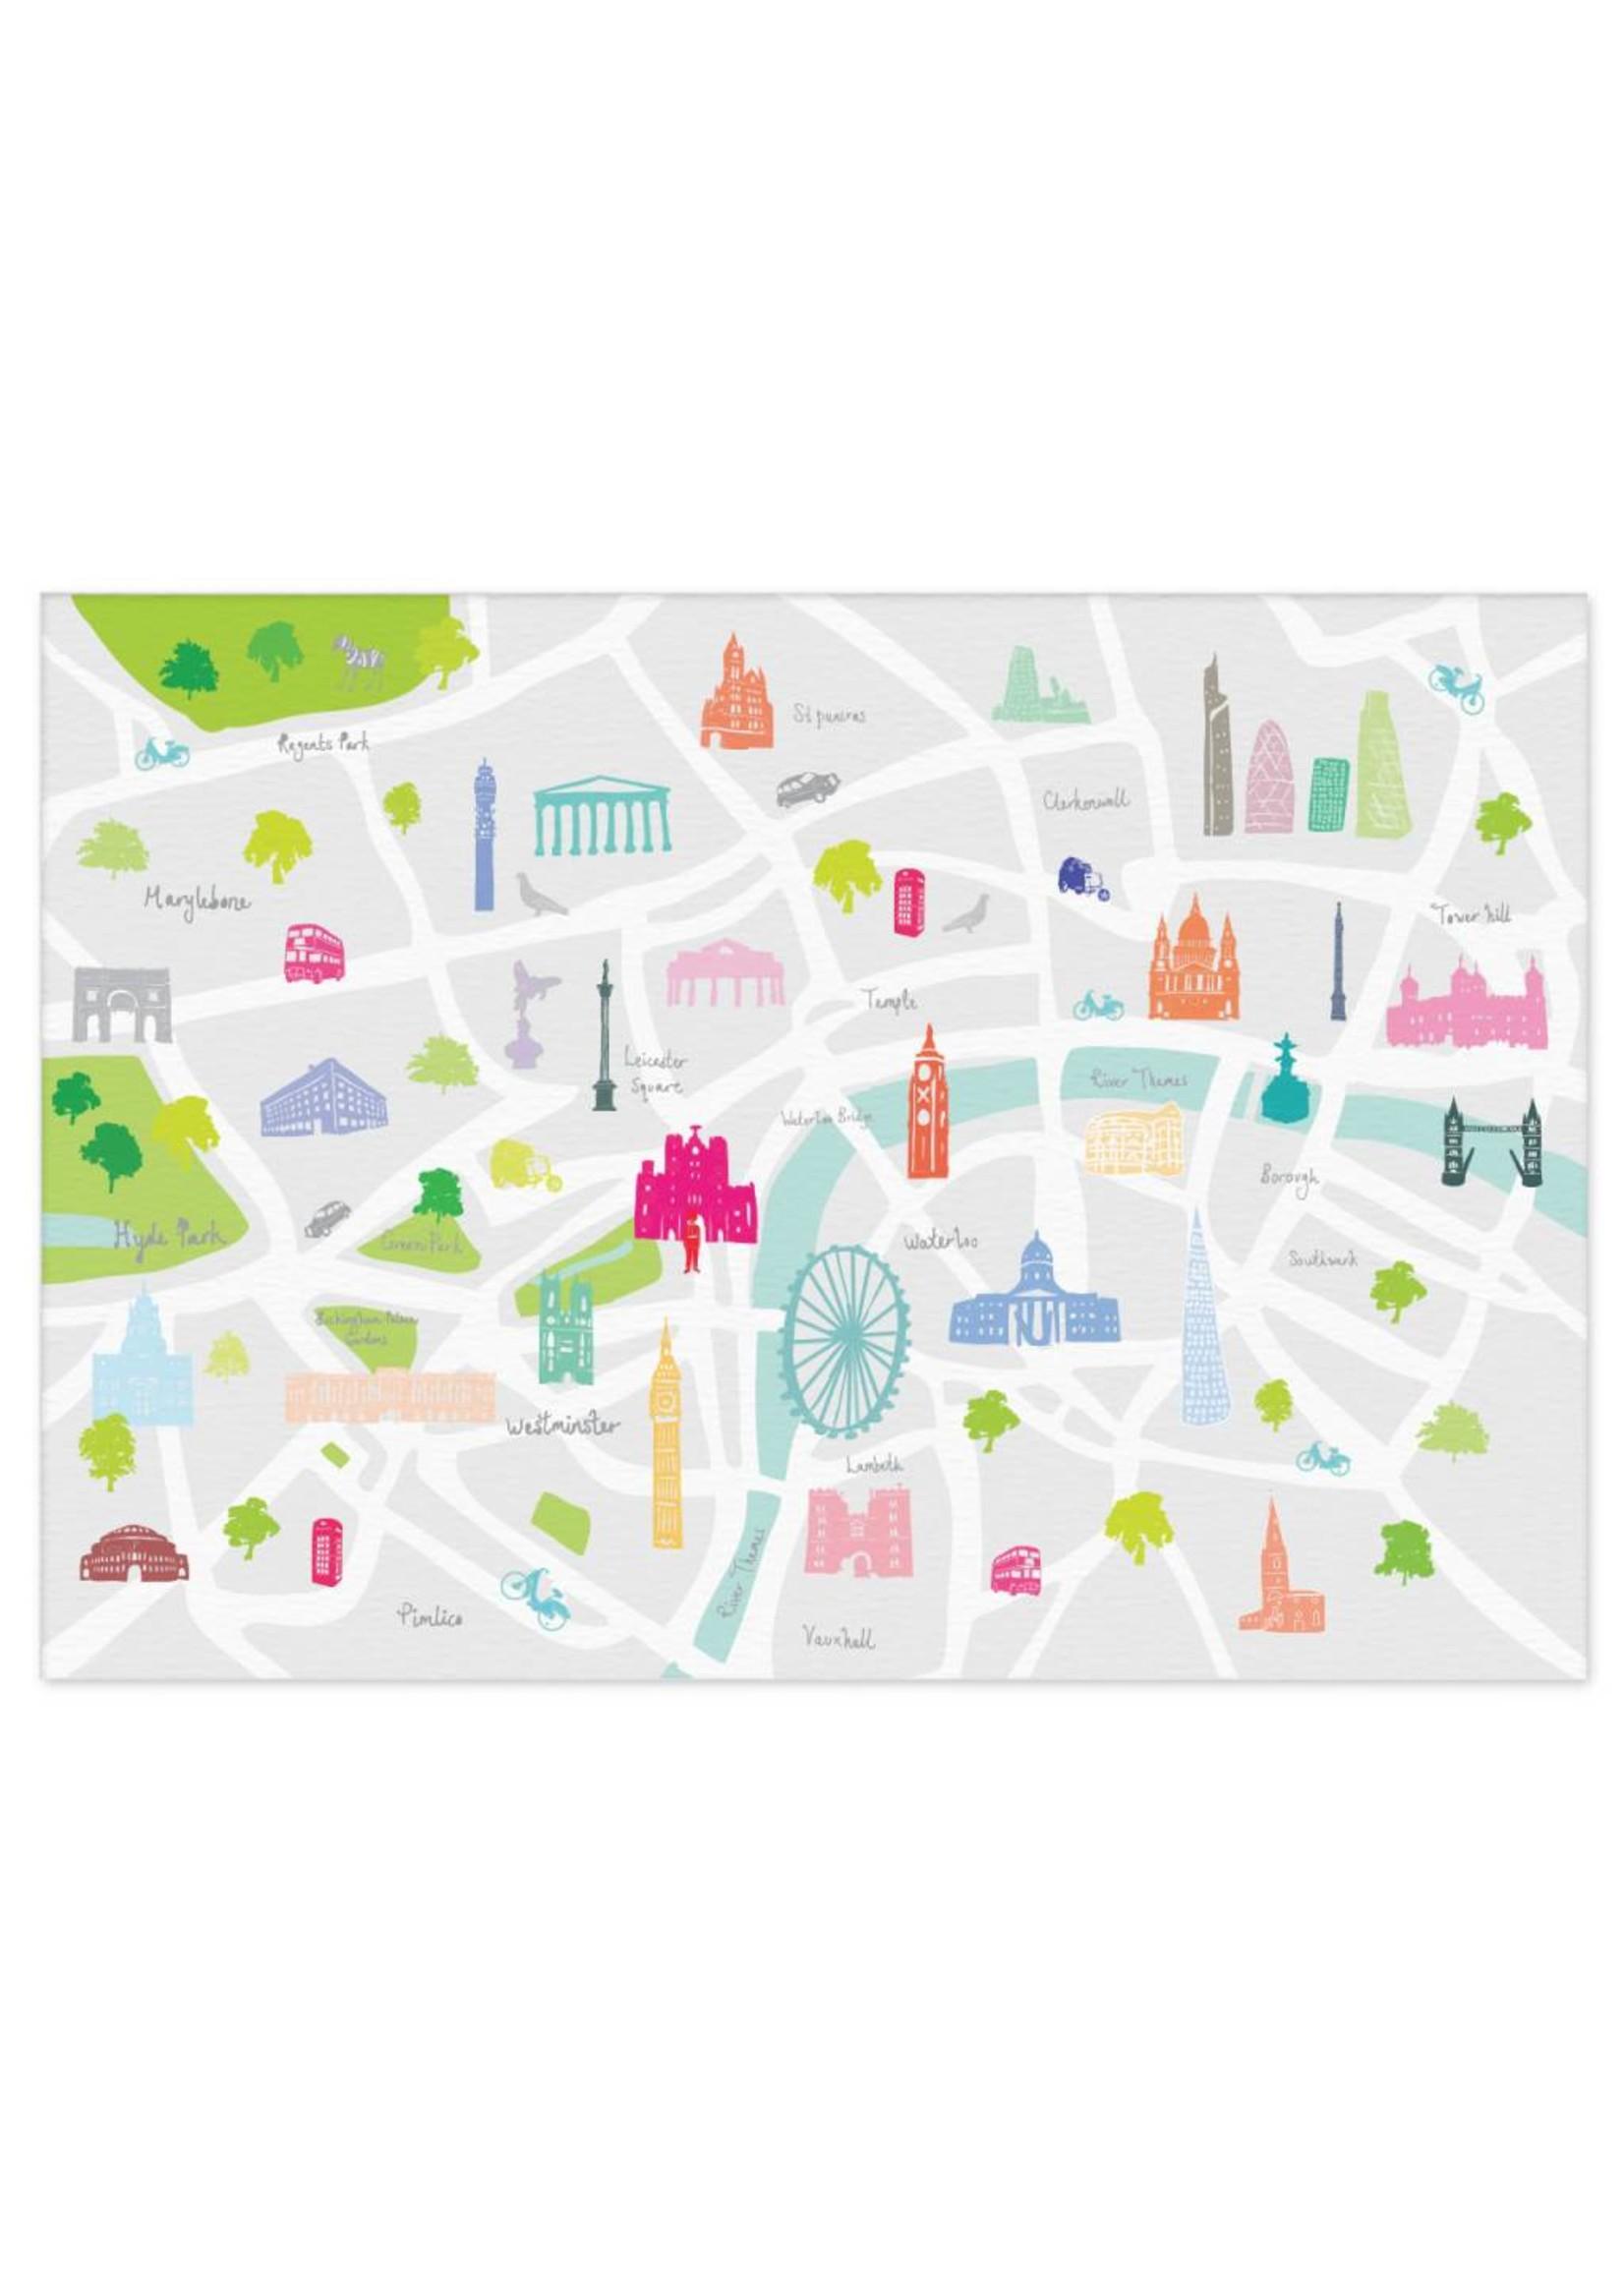 Holly Francesca Holly Francesca Map of London - A3